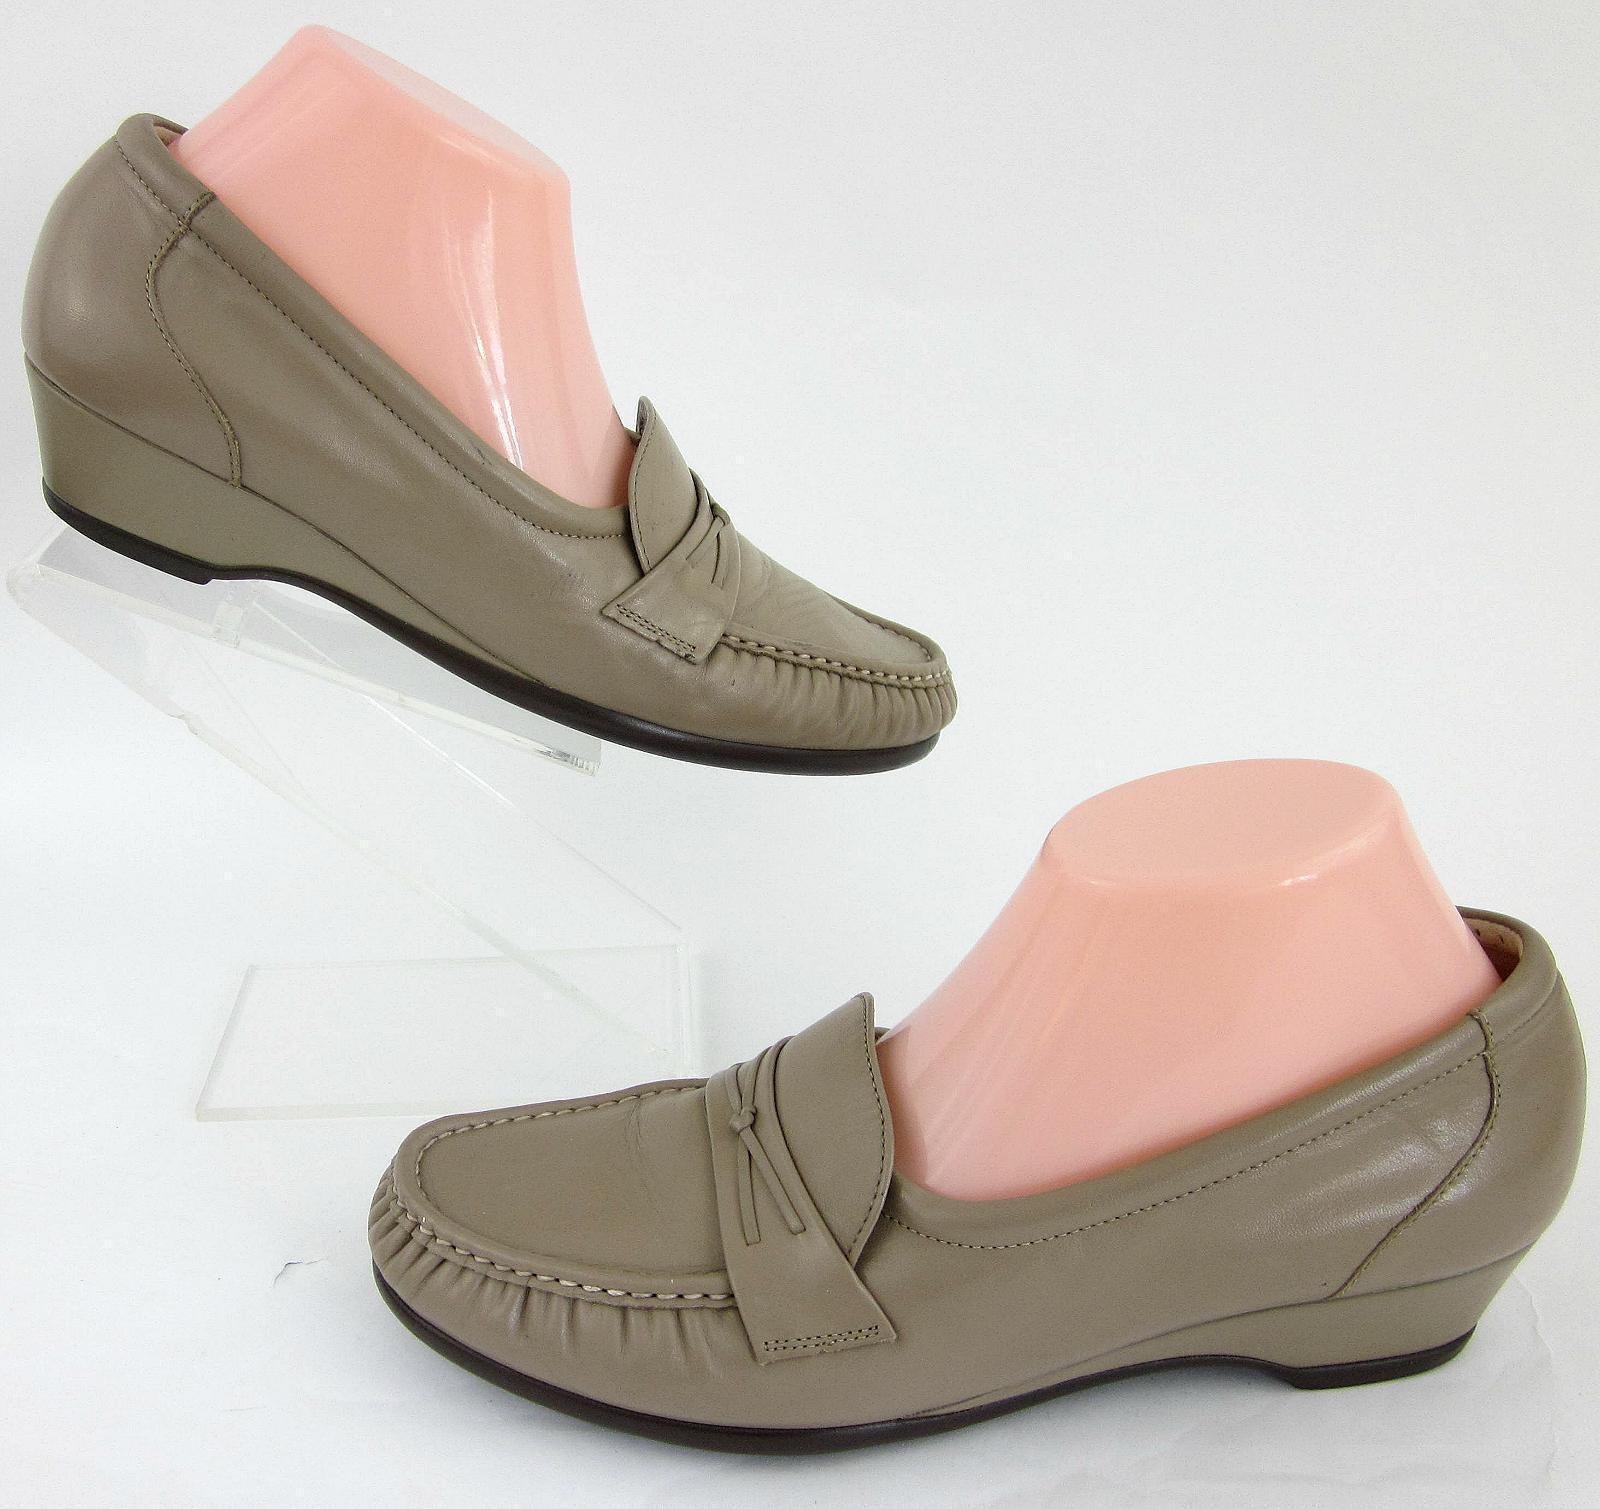 SAS 'Easier' Slip On Moccasin Shoes Mocha Pelle Sz 9.5N Worn Once!